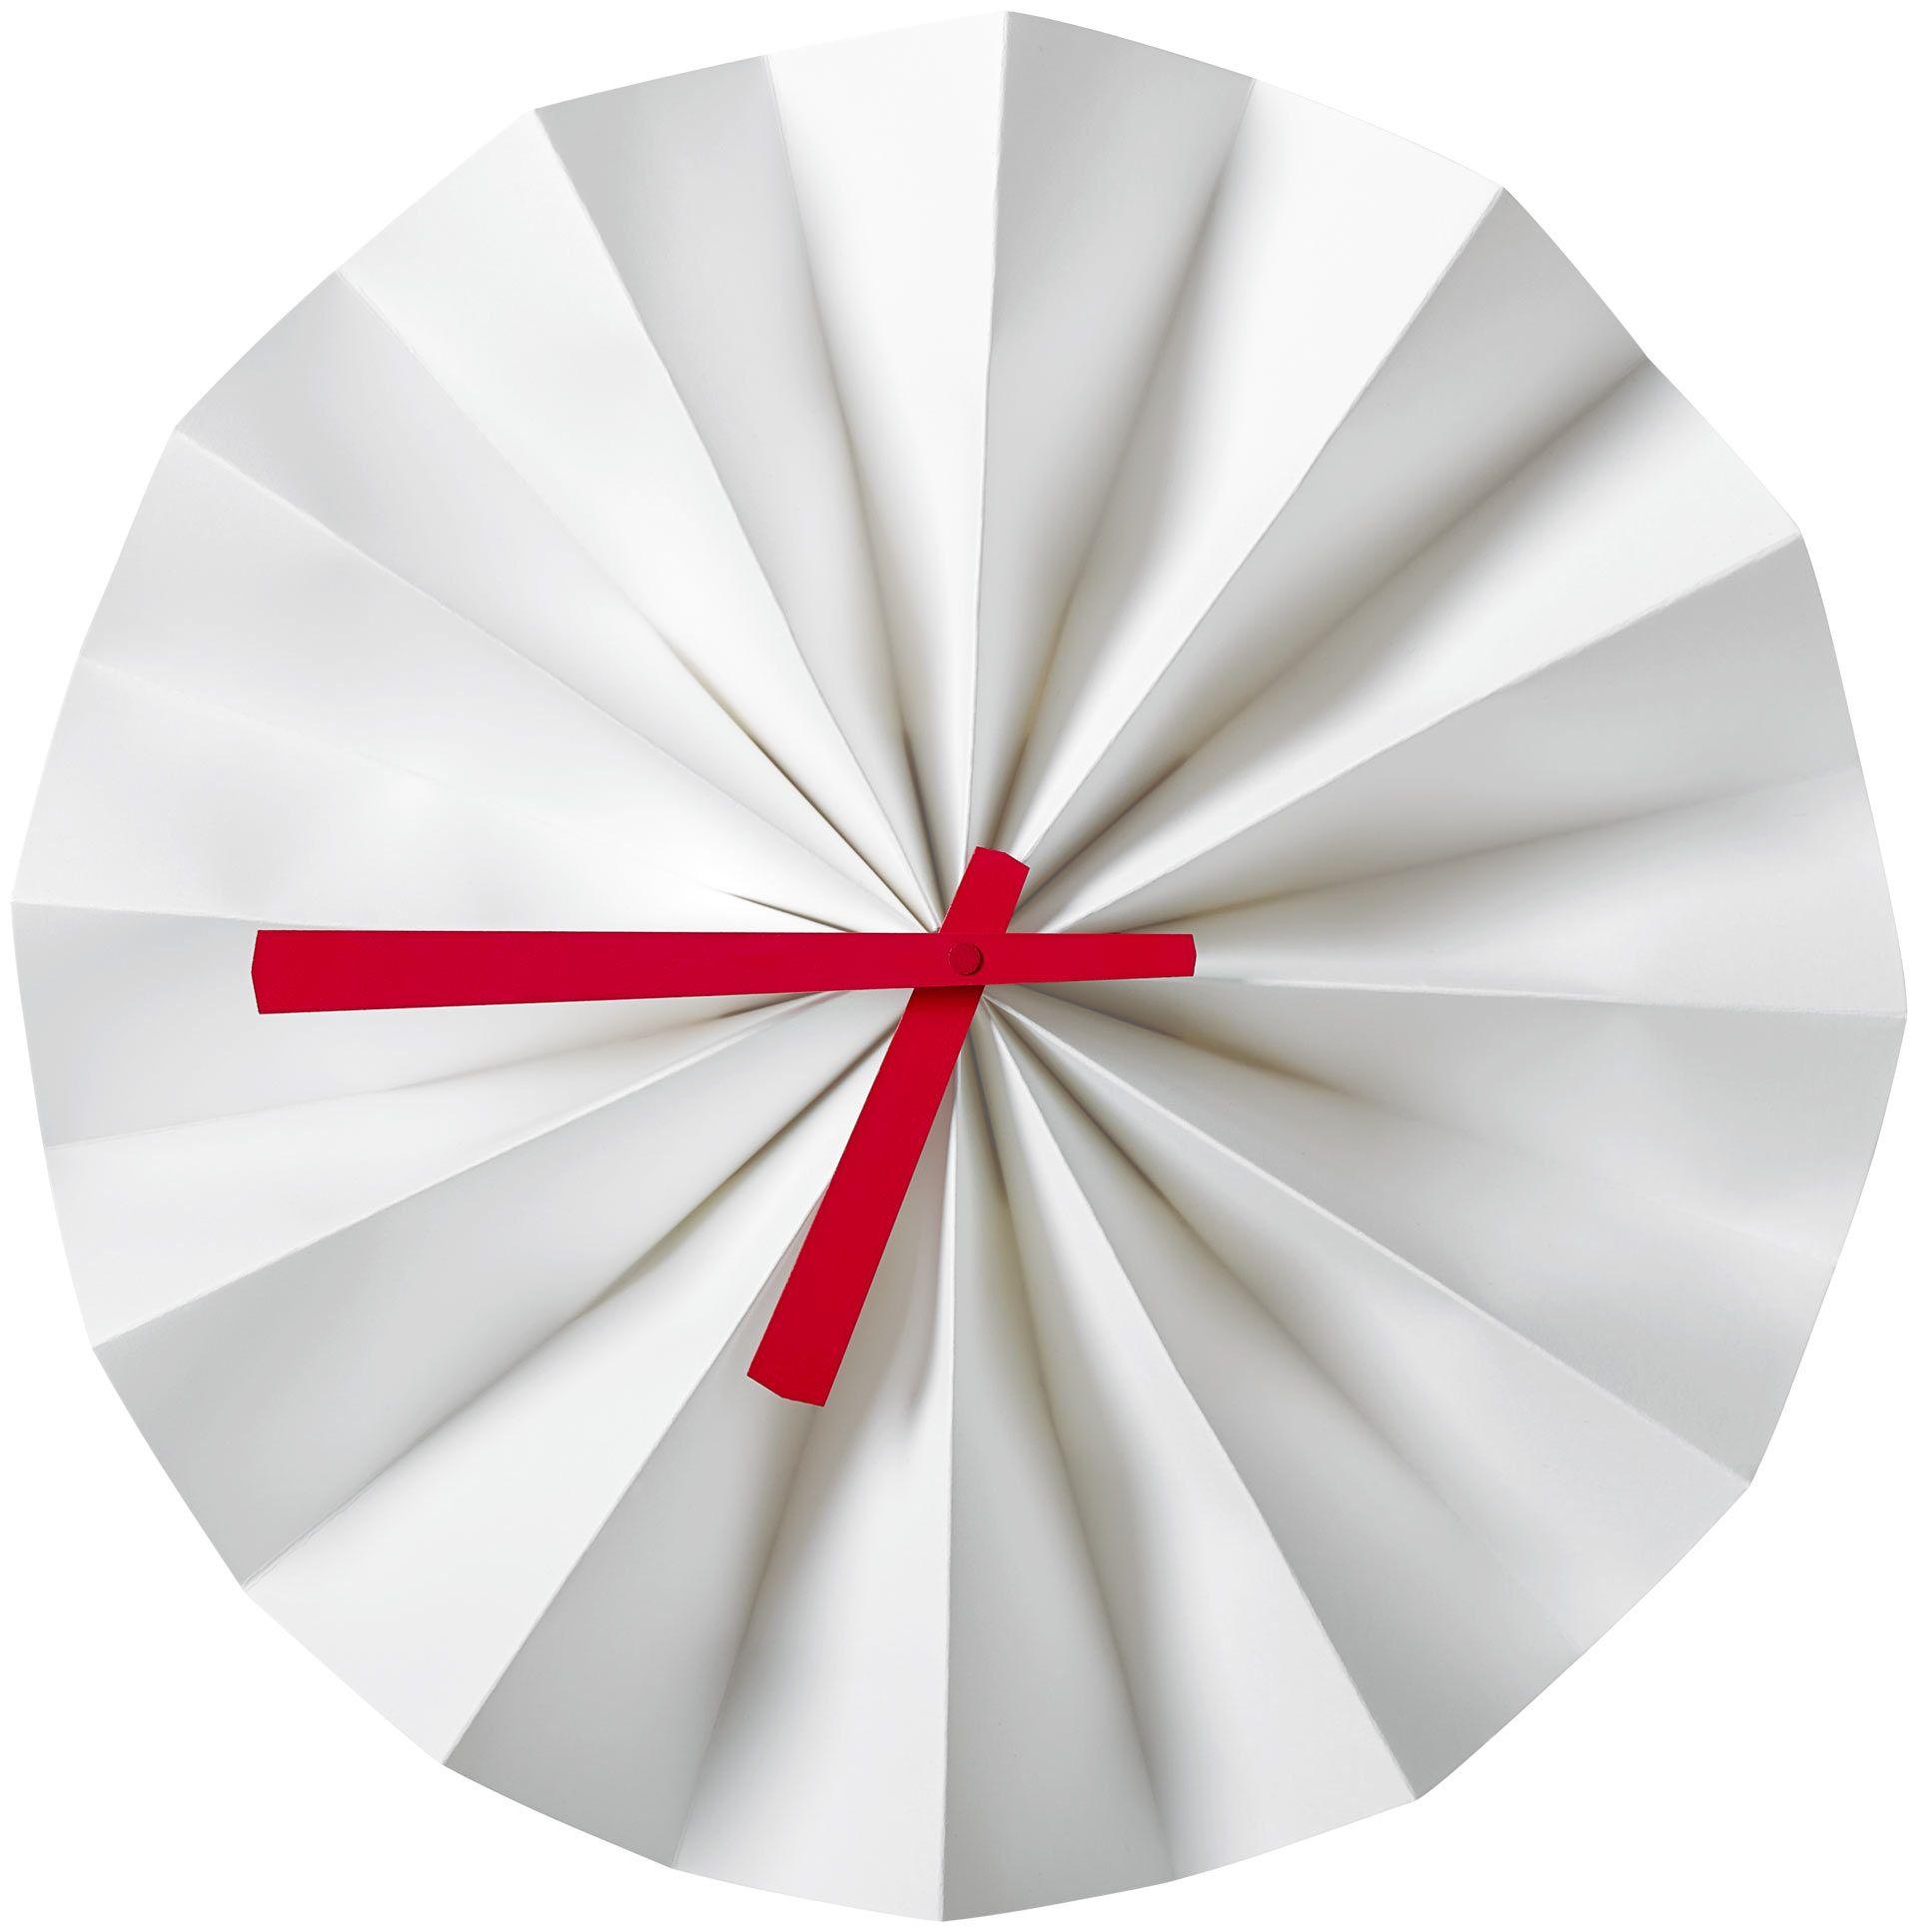 Modern home decor accessories - clocks from BoConcept | Home Stuff ...